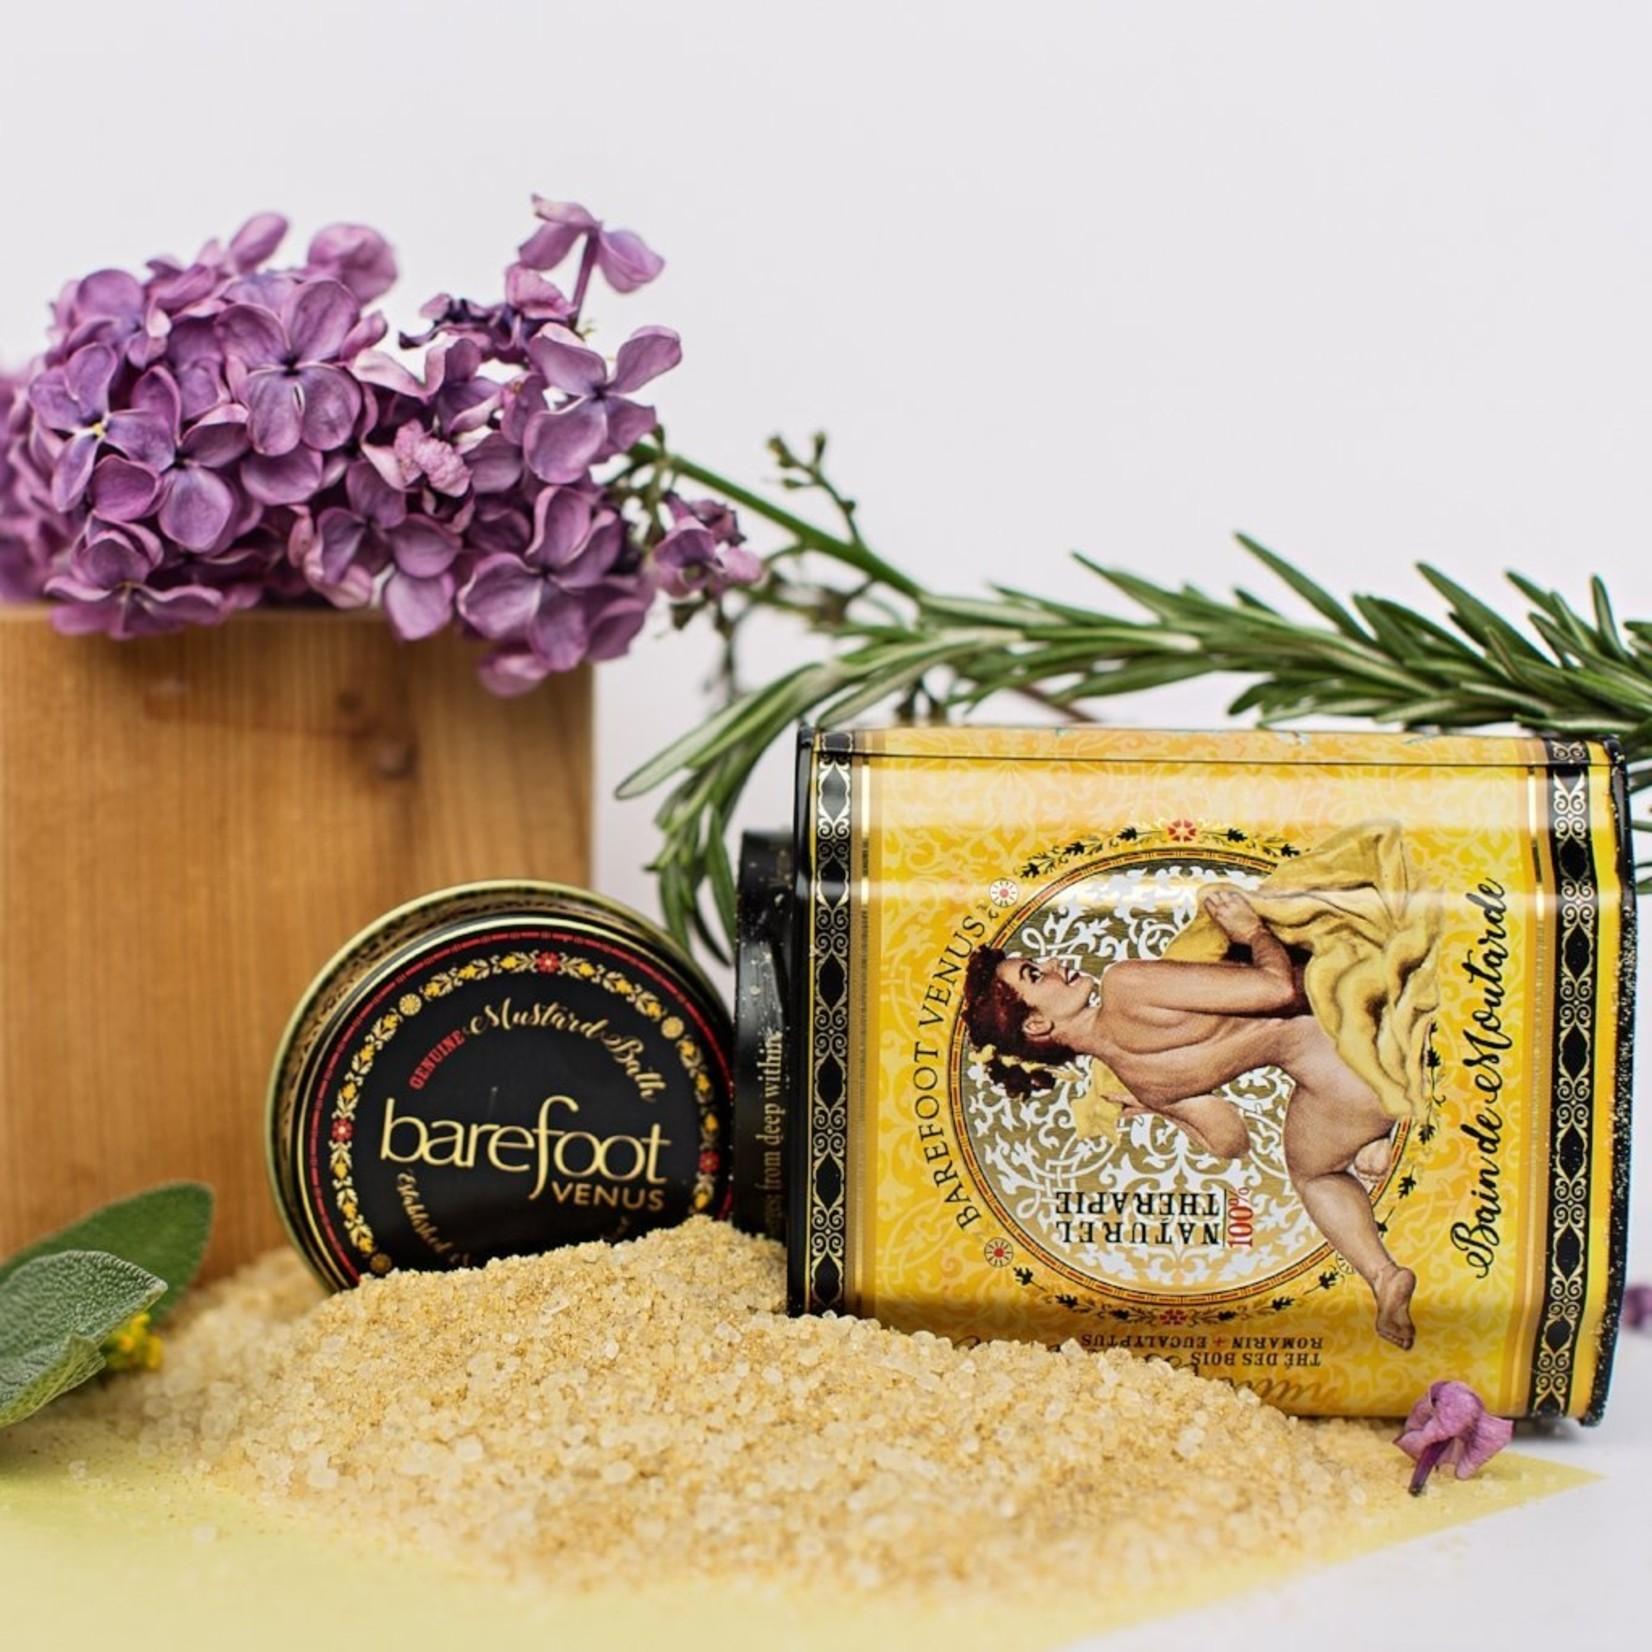 Barefoot Venus 100% Natural Mustard Bath